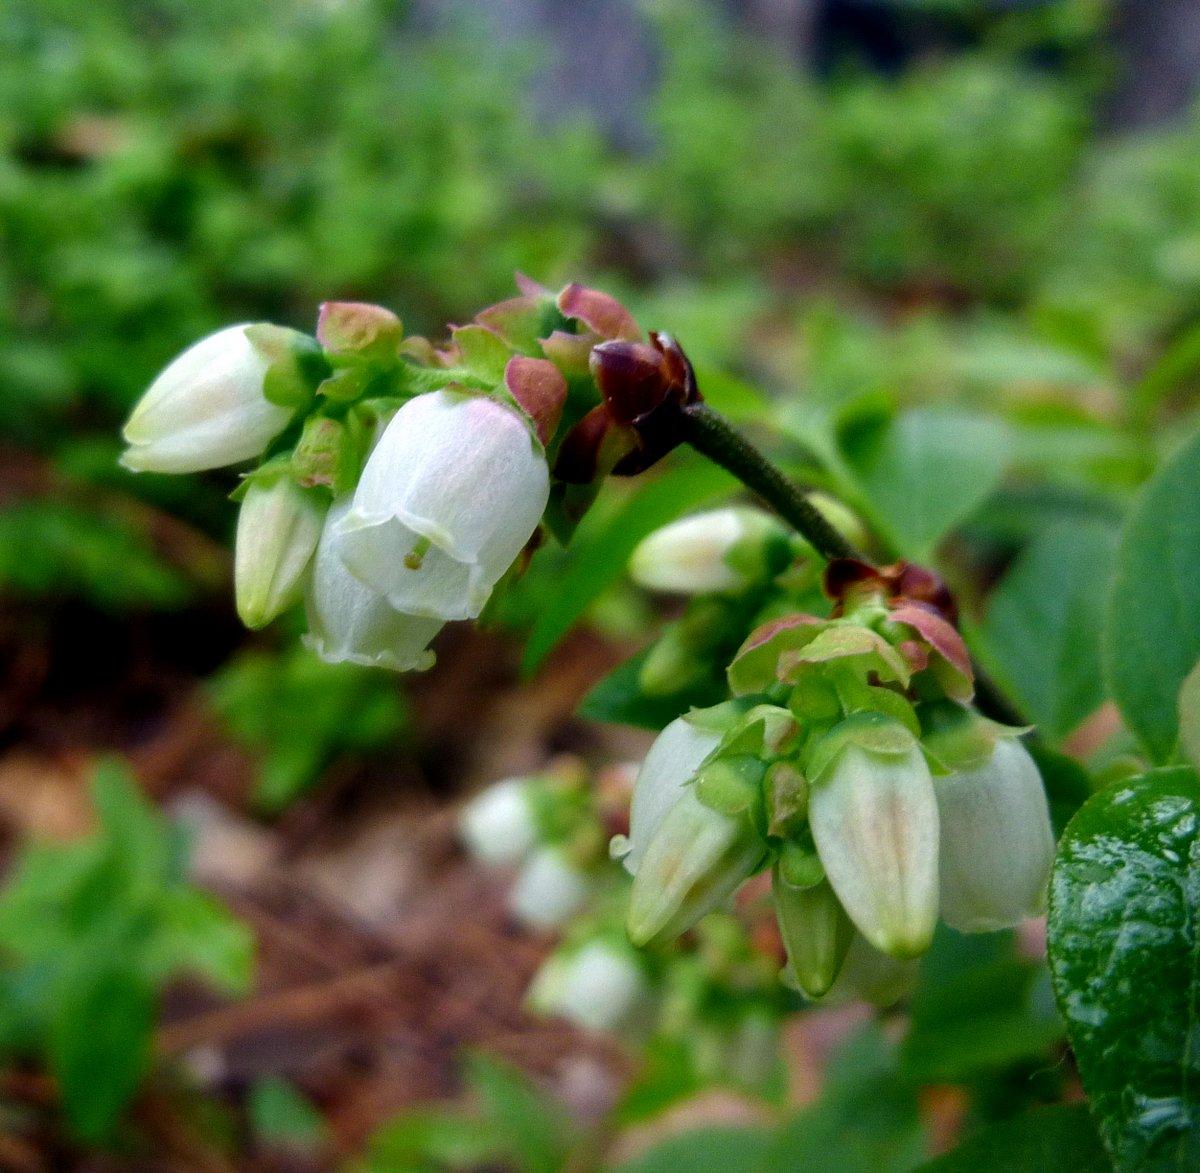 4. Low Bush Blueberry